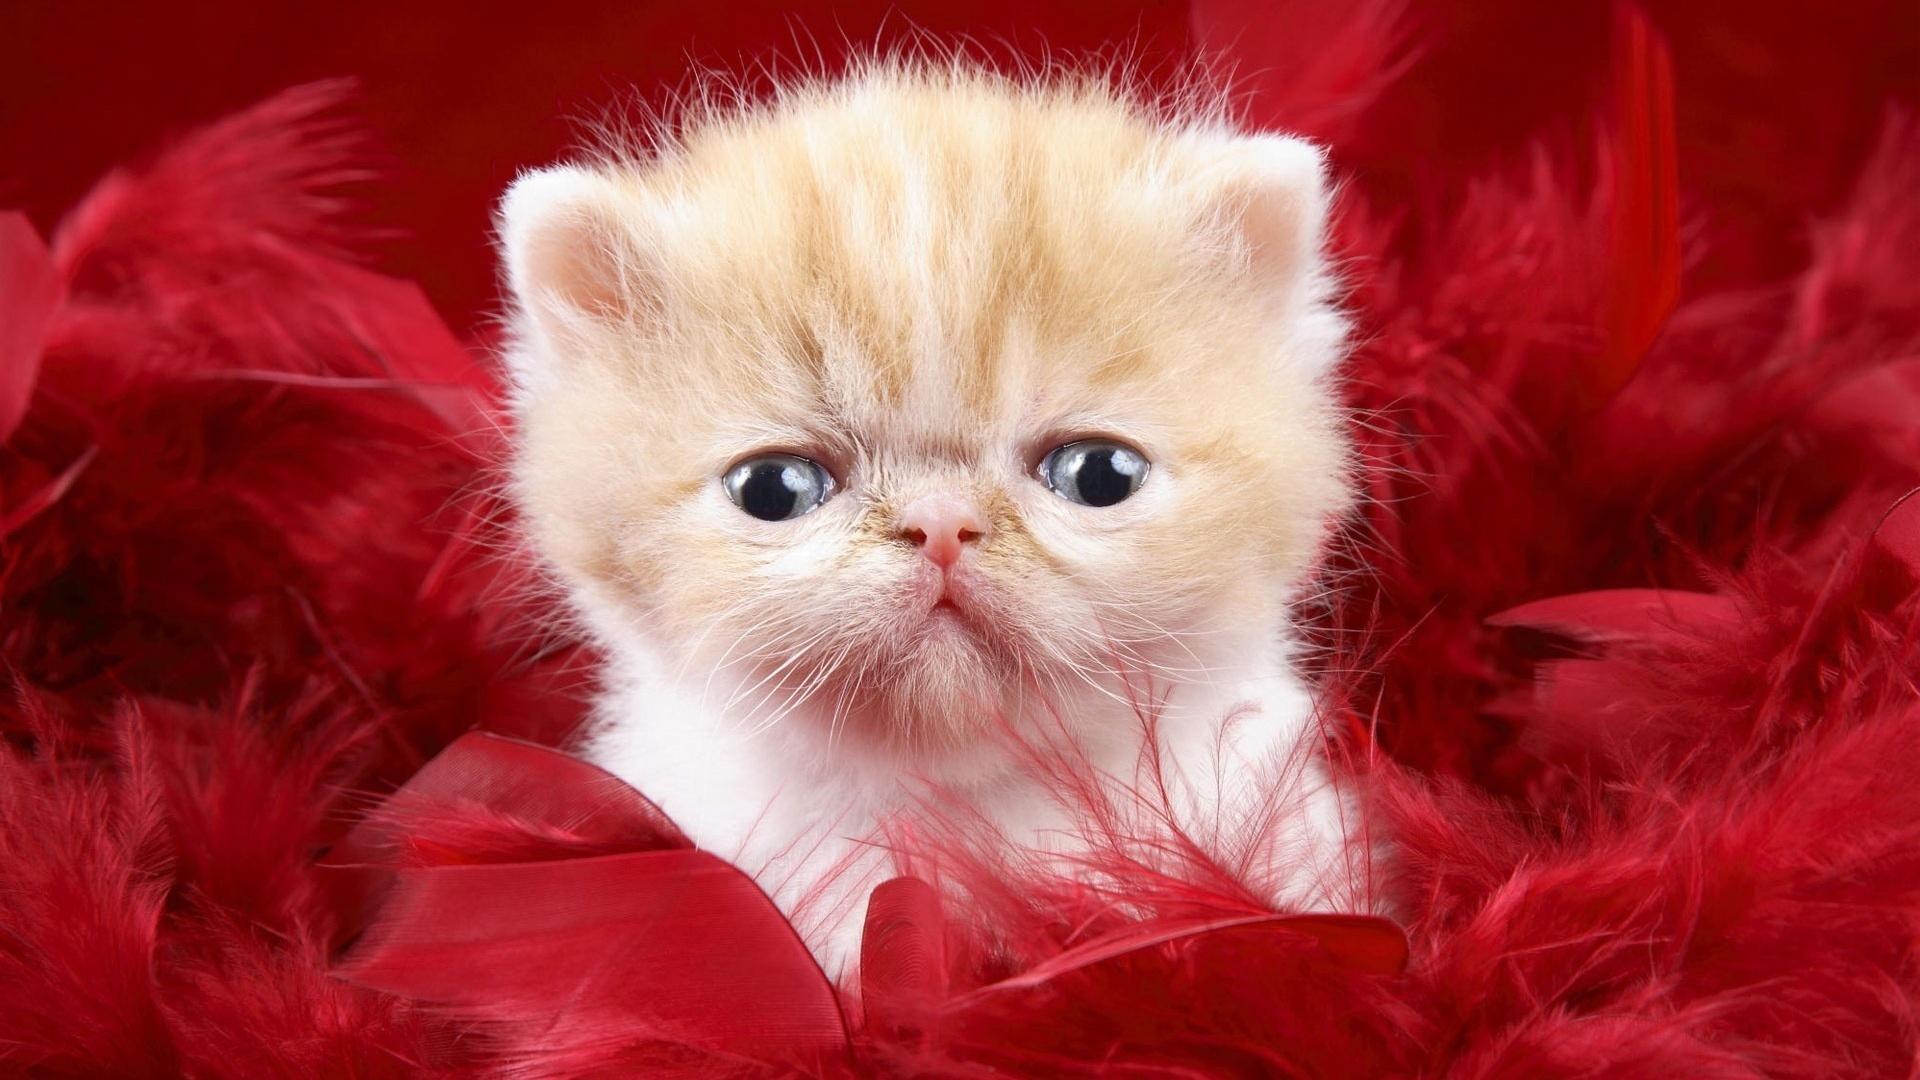 Jordan Carver Best Cats Fluffy Hd Kitty Walls Kitten 526164 Wallpaper wallpaper